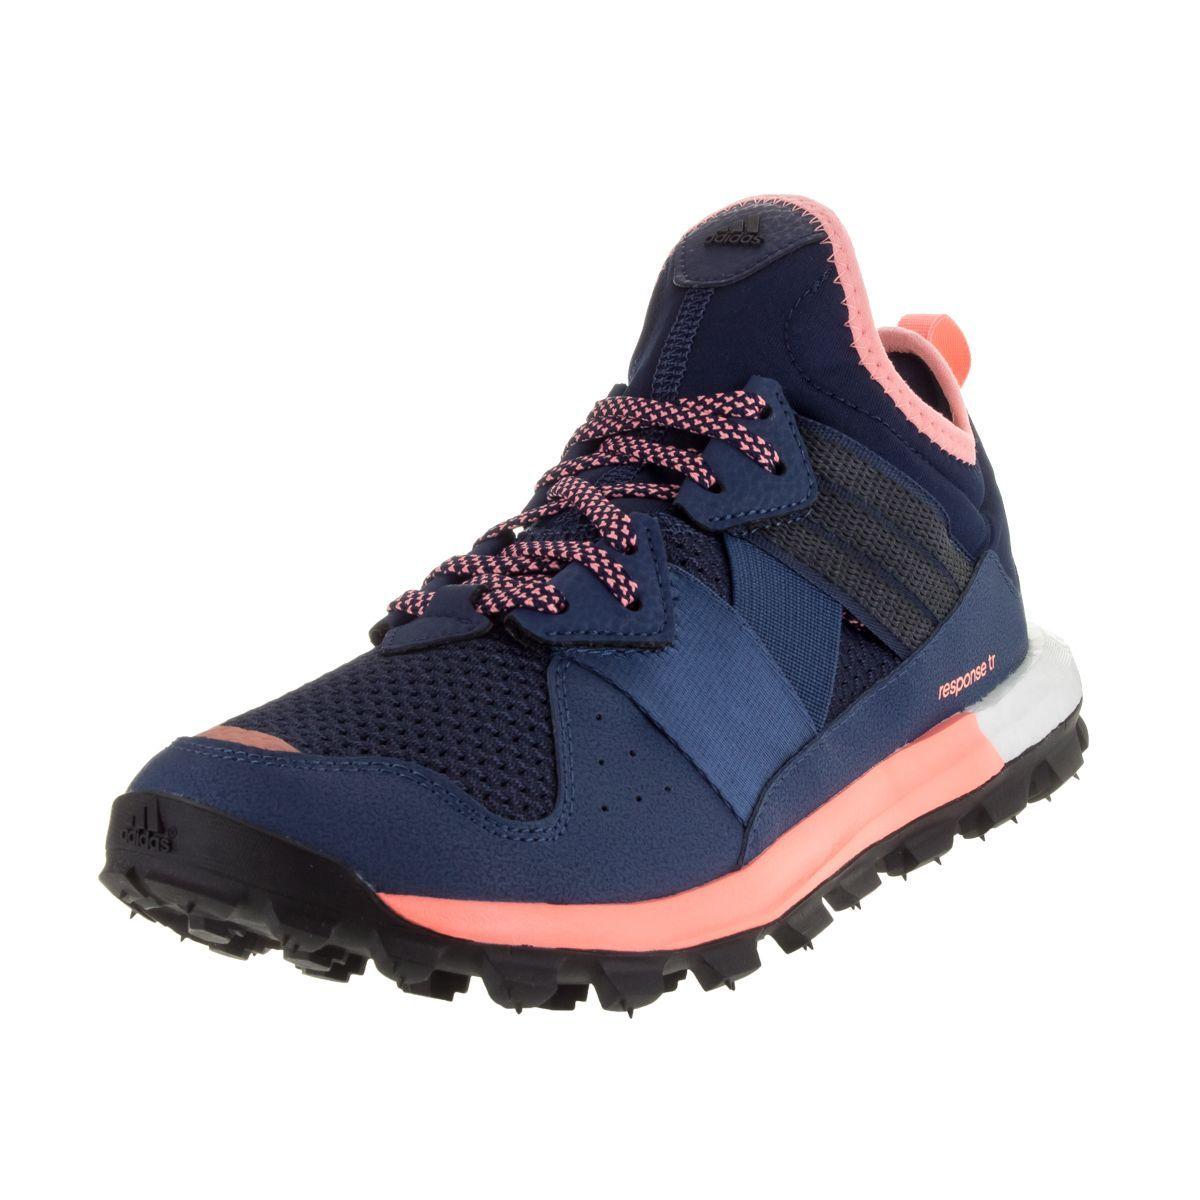 adidas donne risposta tr p / pesca scarpa da corsa y zapatos